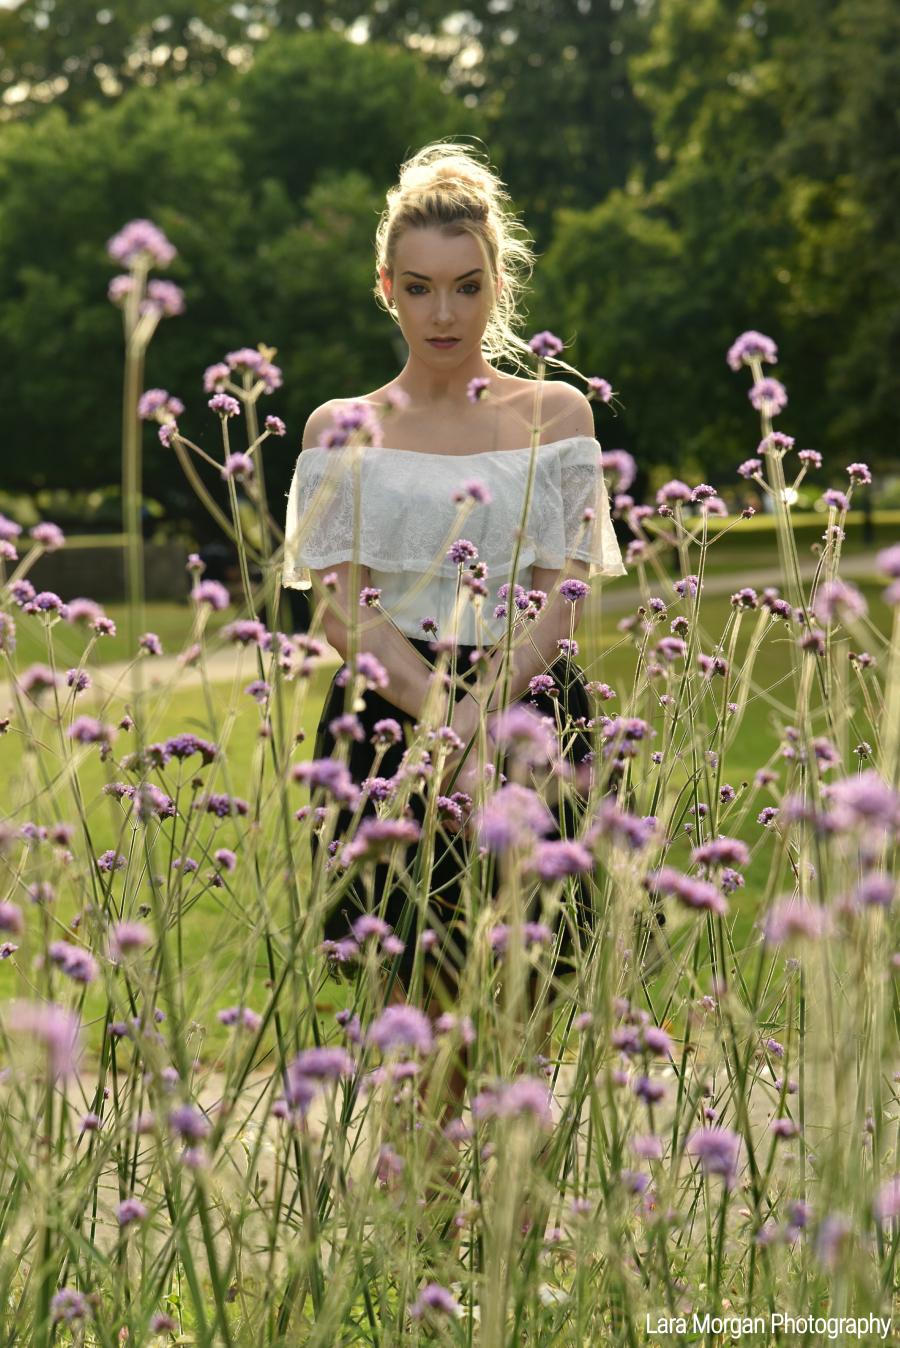 In your dream / Photography by Lara Morgan, Model Cindafckinrella, Makeup by Cindafckinrella, Post processing by Lara Morgan / Uploaded 30th July 2019 @ 07:36 AM